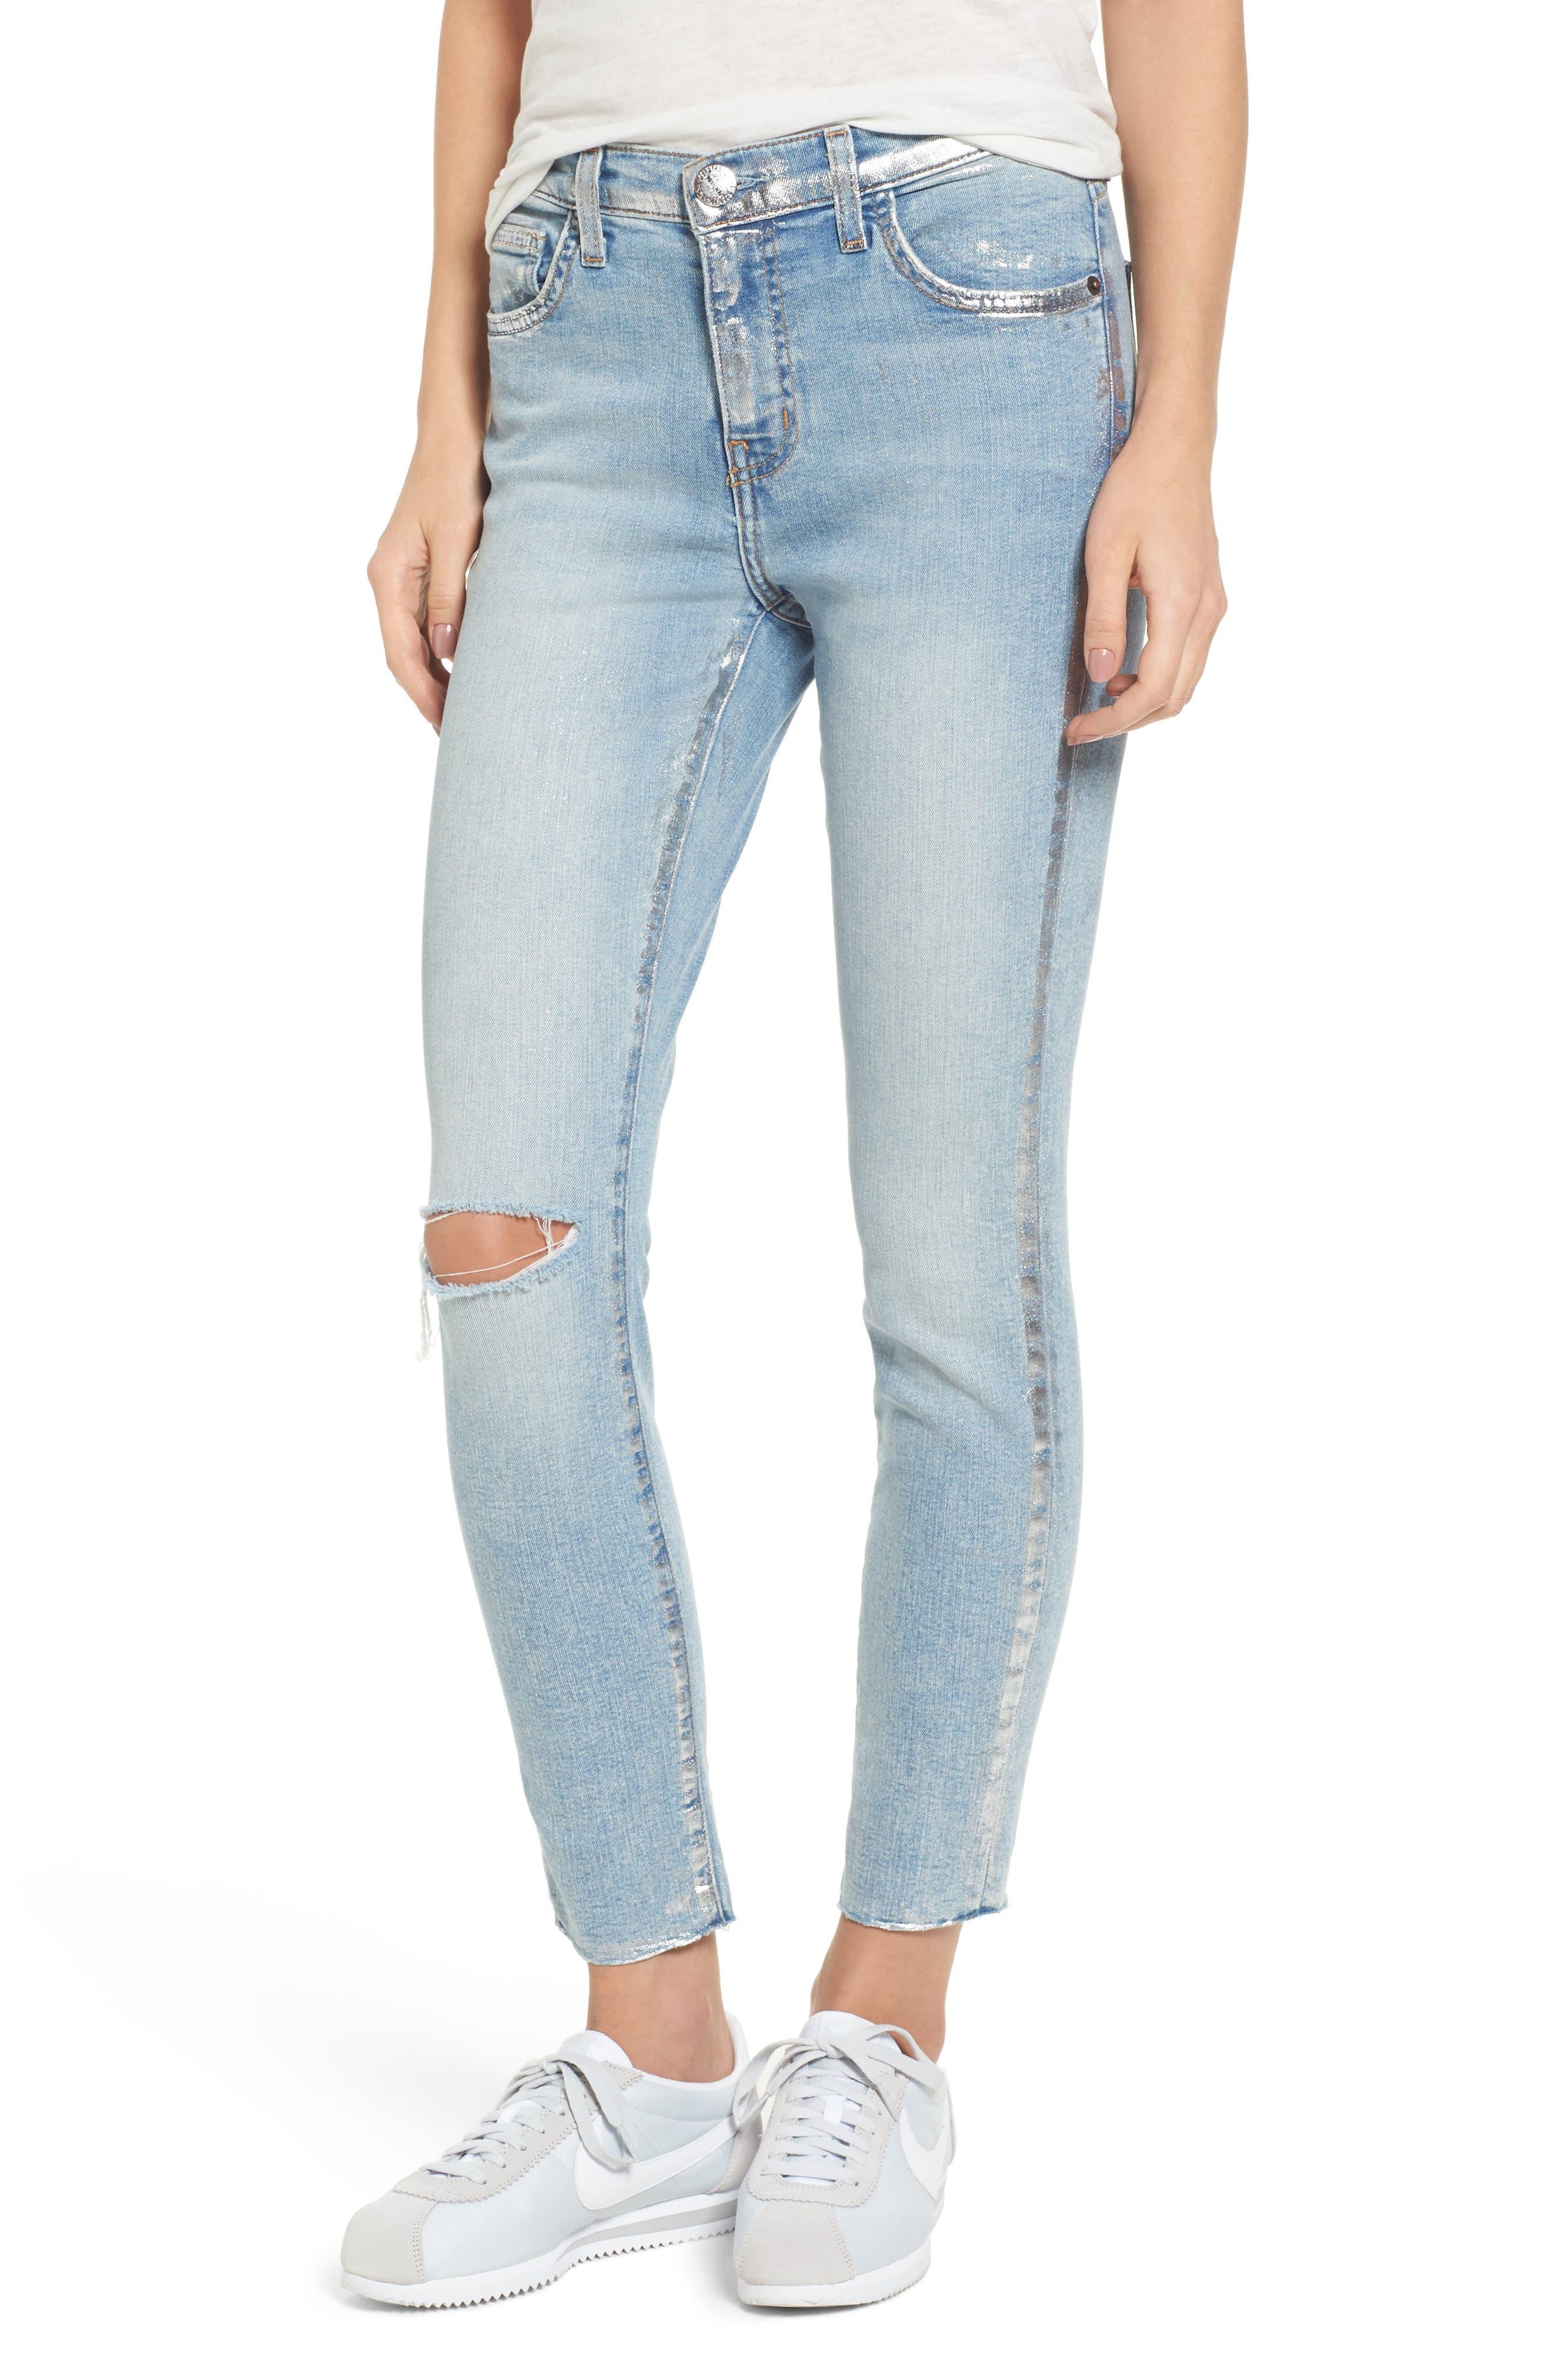 The Stiletto High Waist Skinny Jeans,                             Main thumbnail 1, color,                             Seville Destroy/ Foil